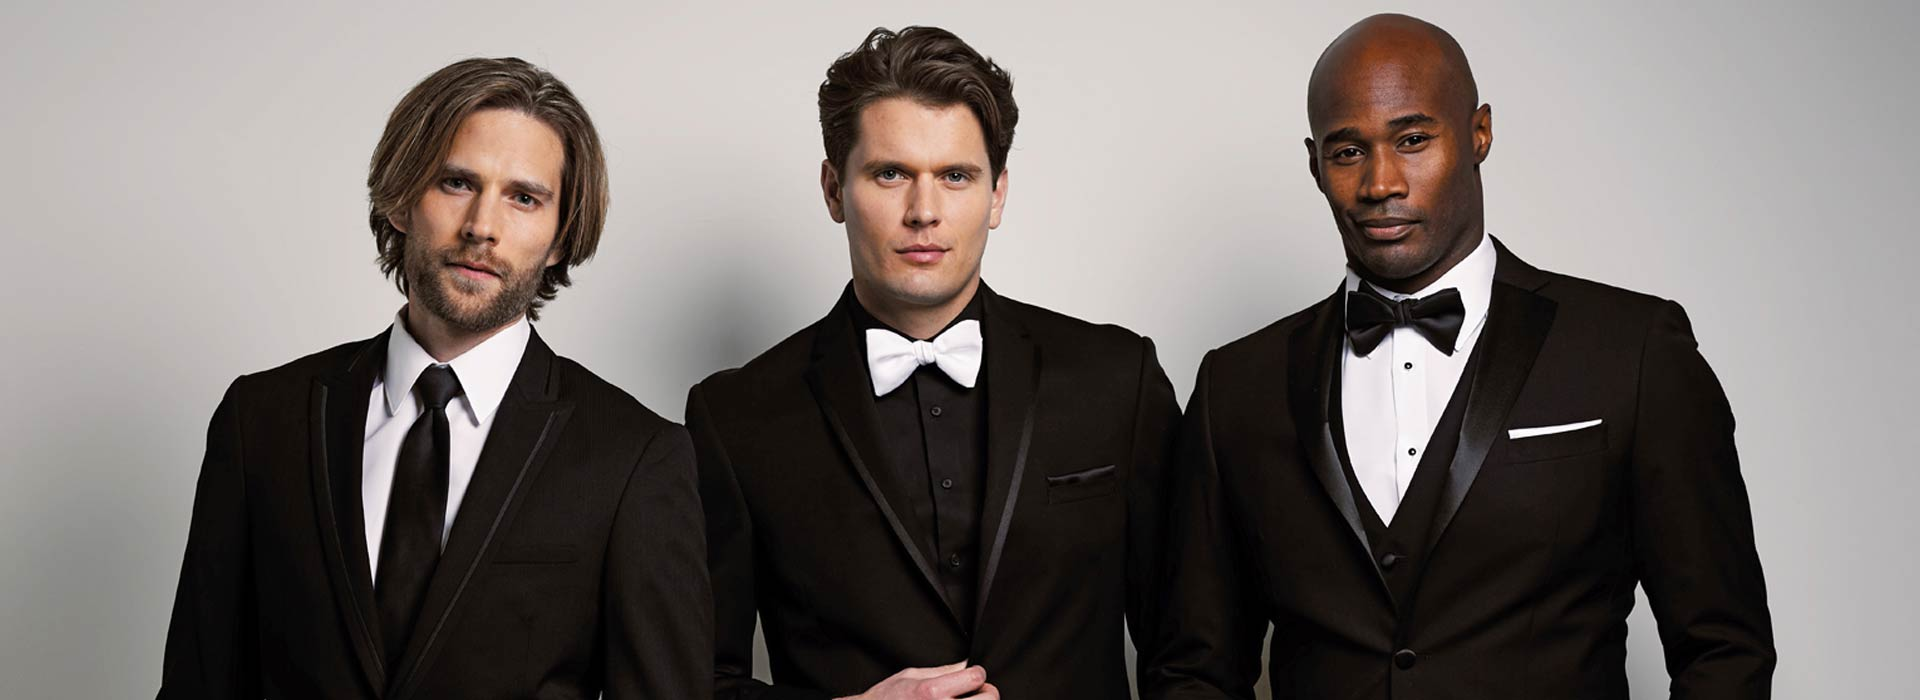 Three men in black tuxedos image